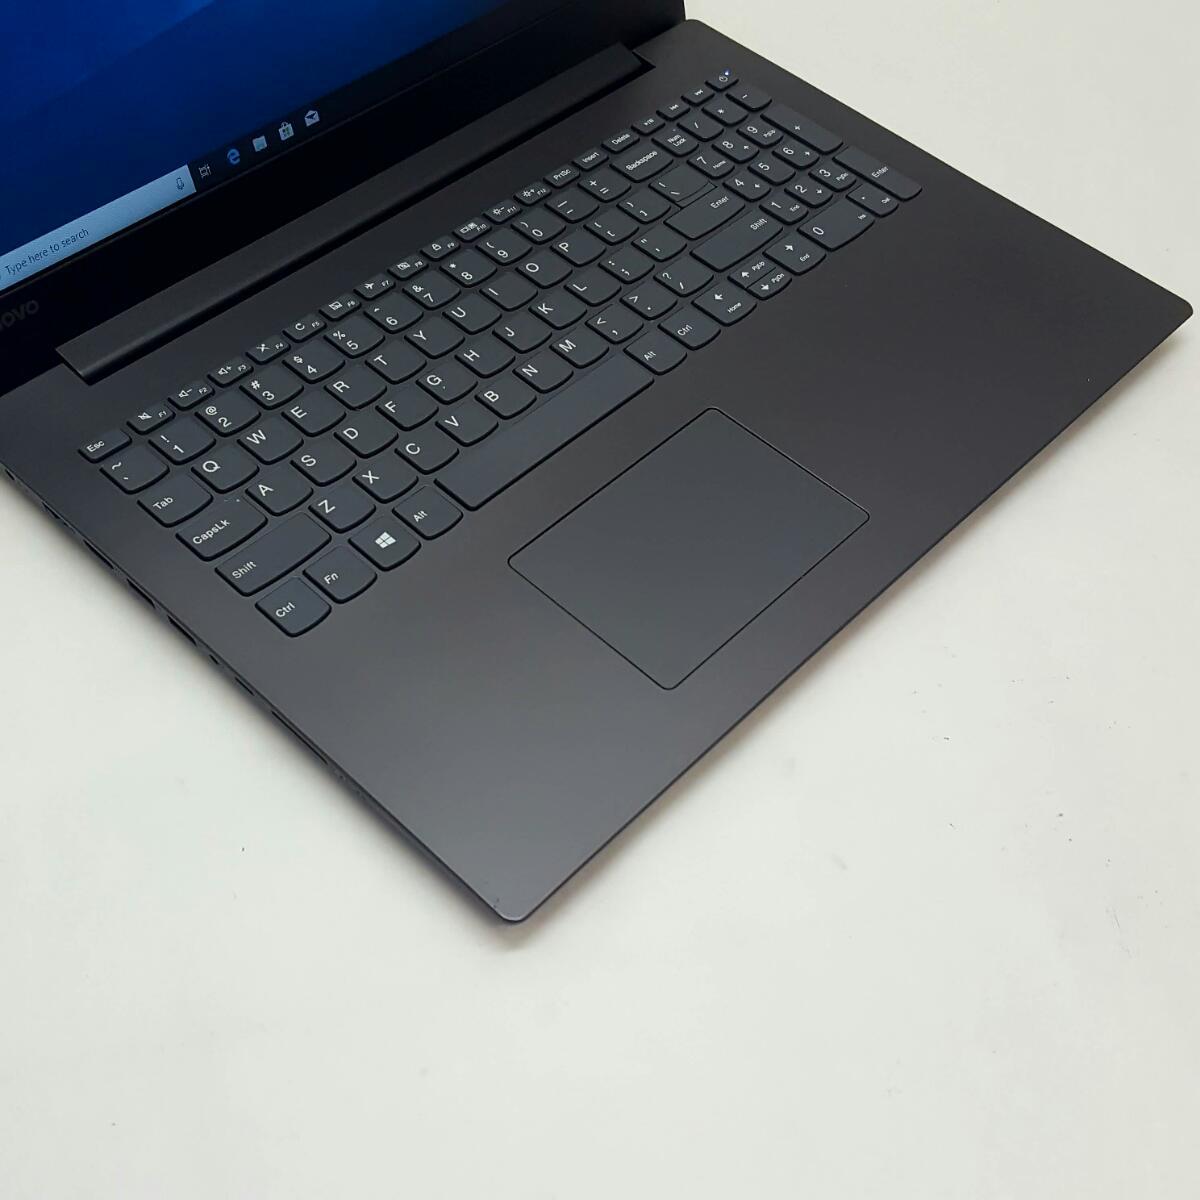 Lenovo Ideapad 330S-15IKB - Intel i3 8th Gen - 4GB Ram- 1TB